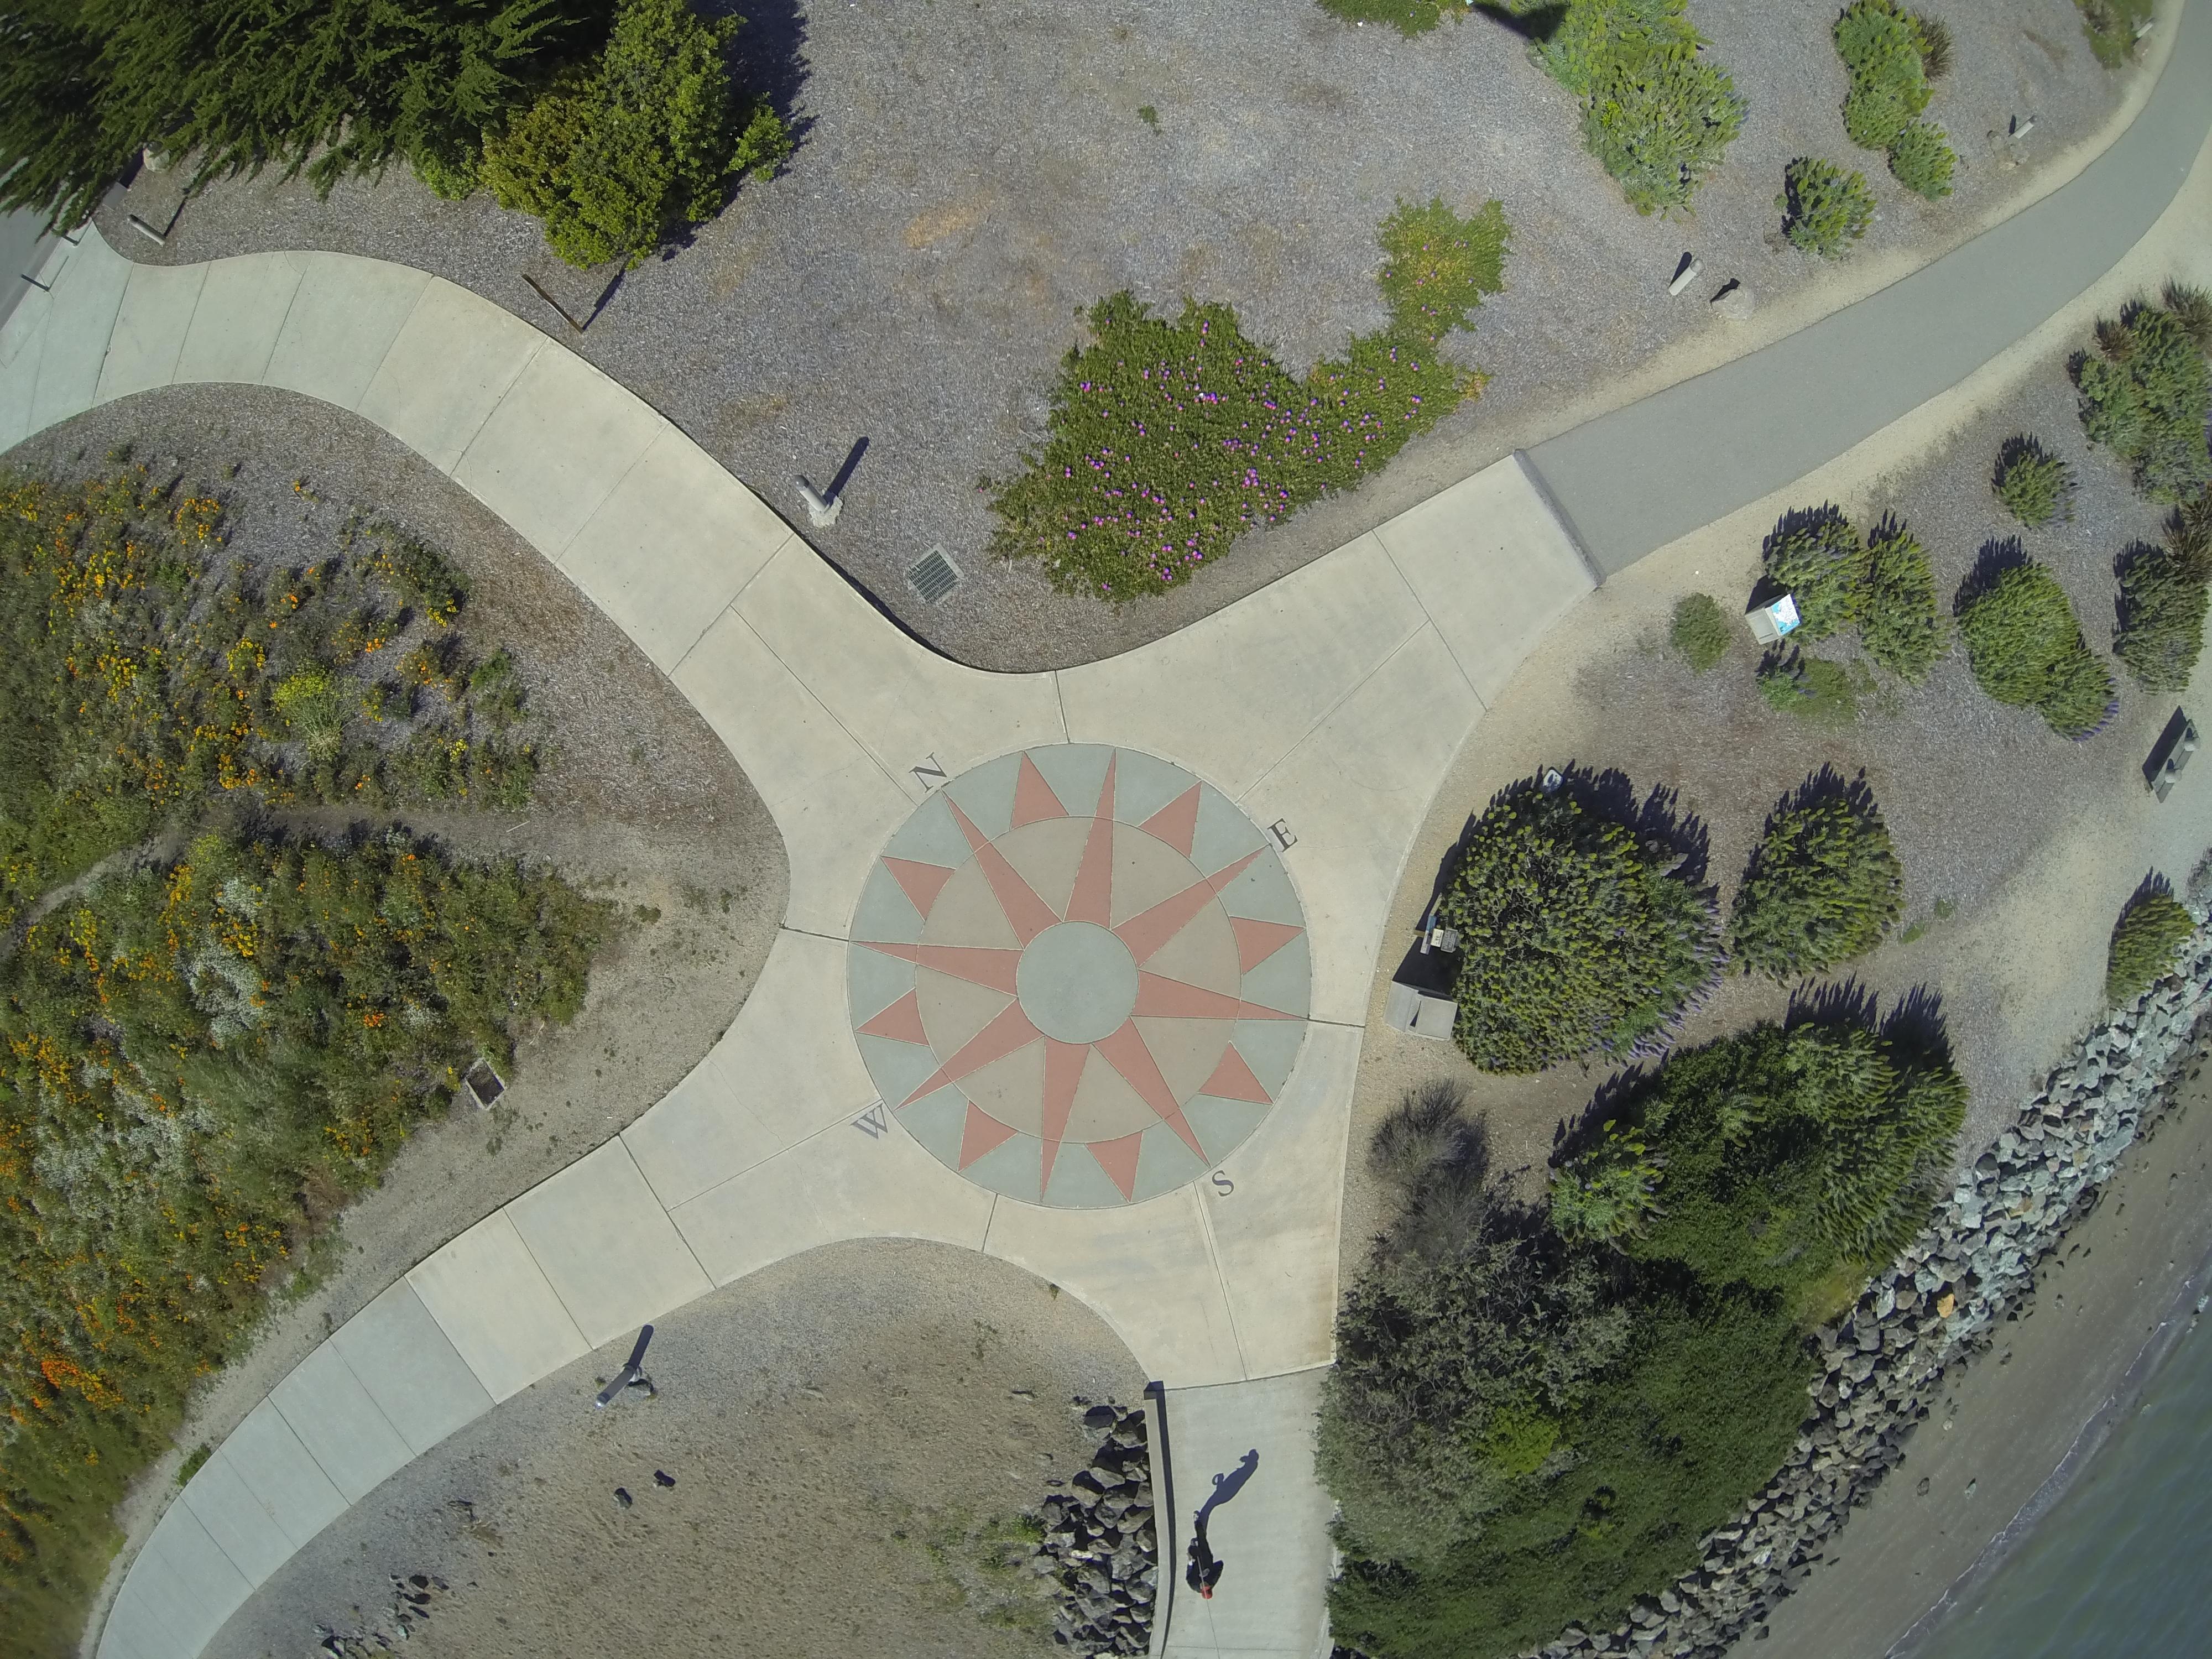 2014-04-28-us-california-richmond-barabara-jay-vincent-park